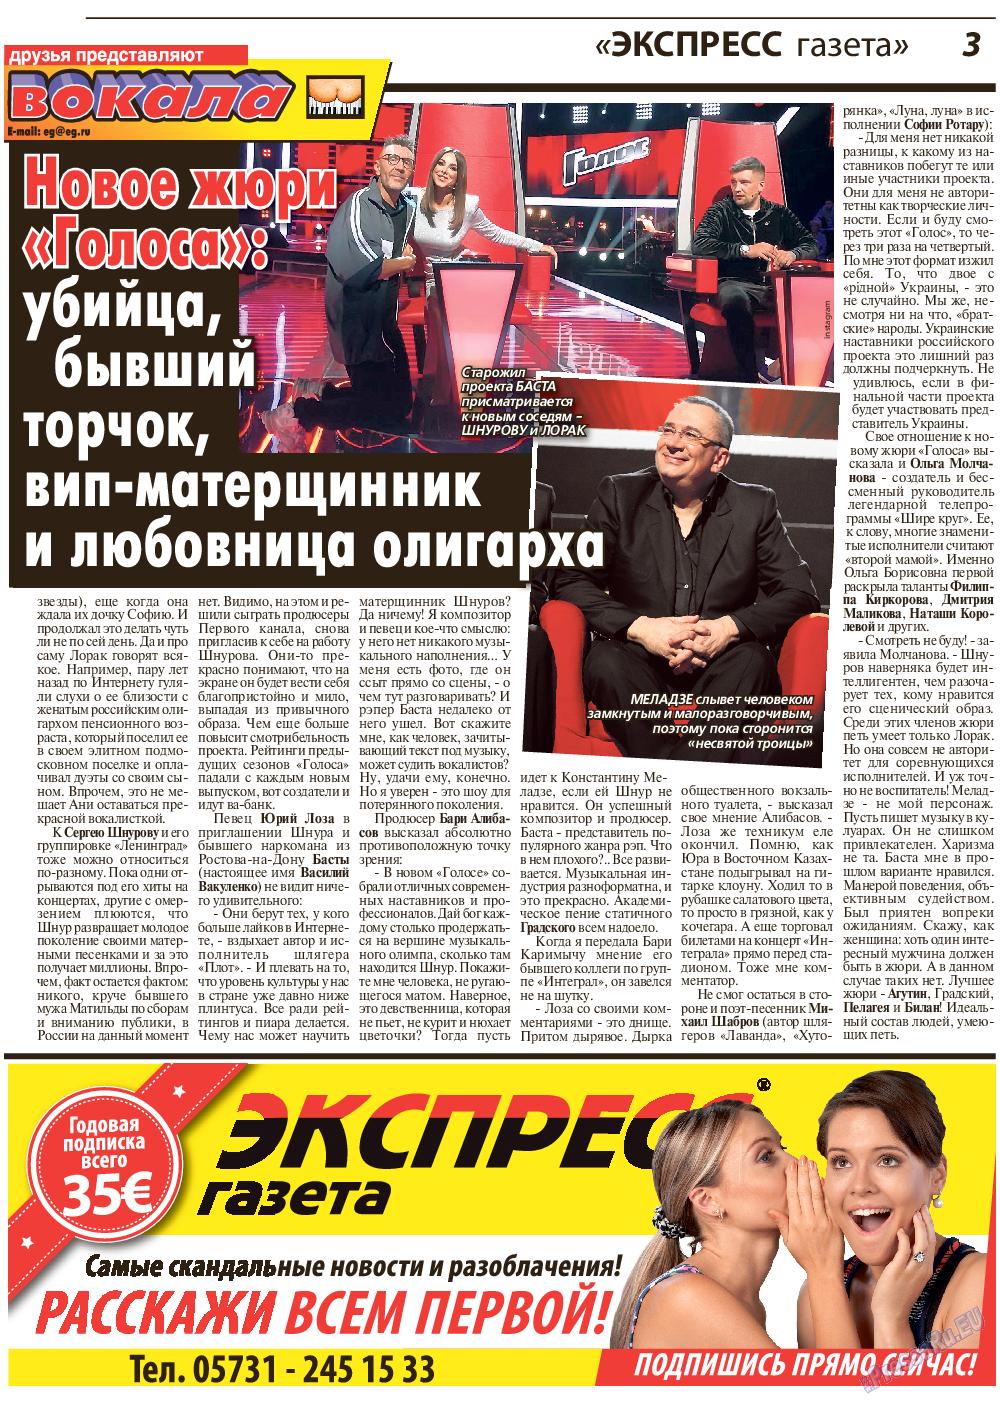 Экспресс газета (газета). 2018 год, номер 10, стр. 3